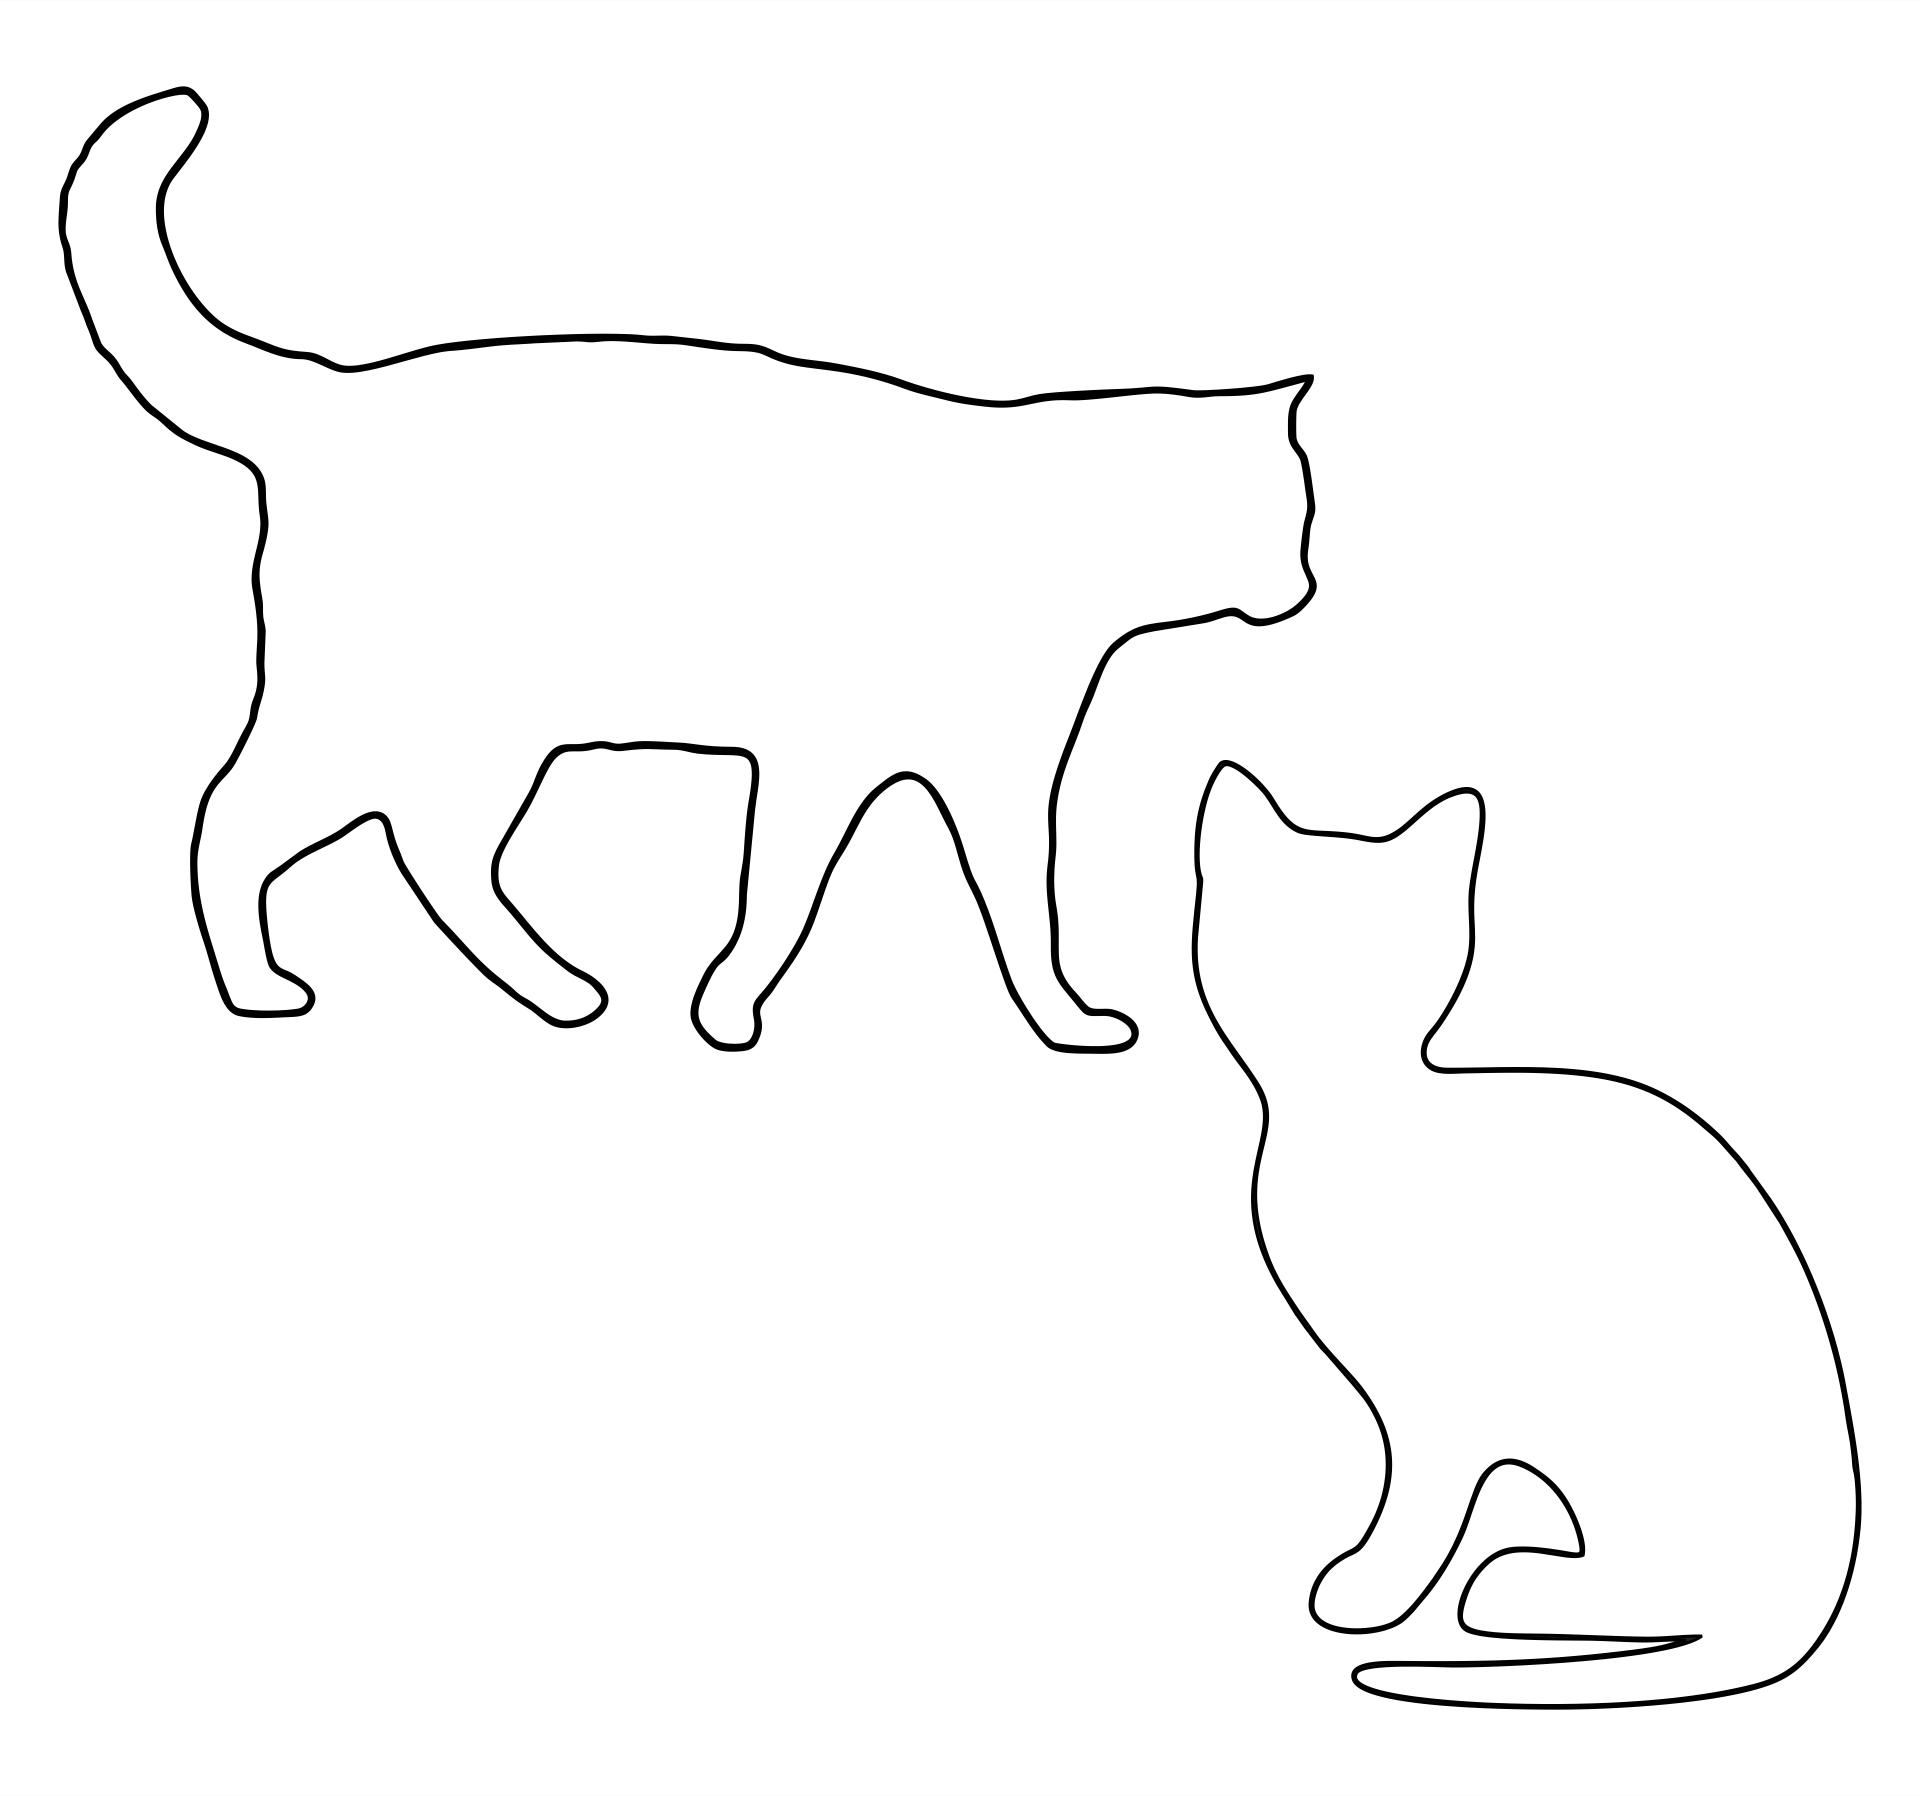 Printable Cat Templates